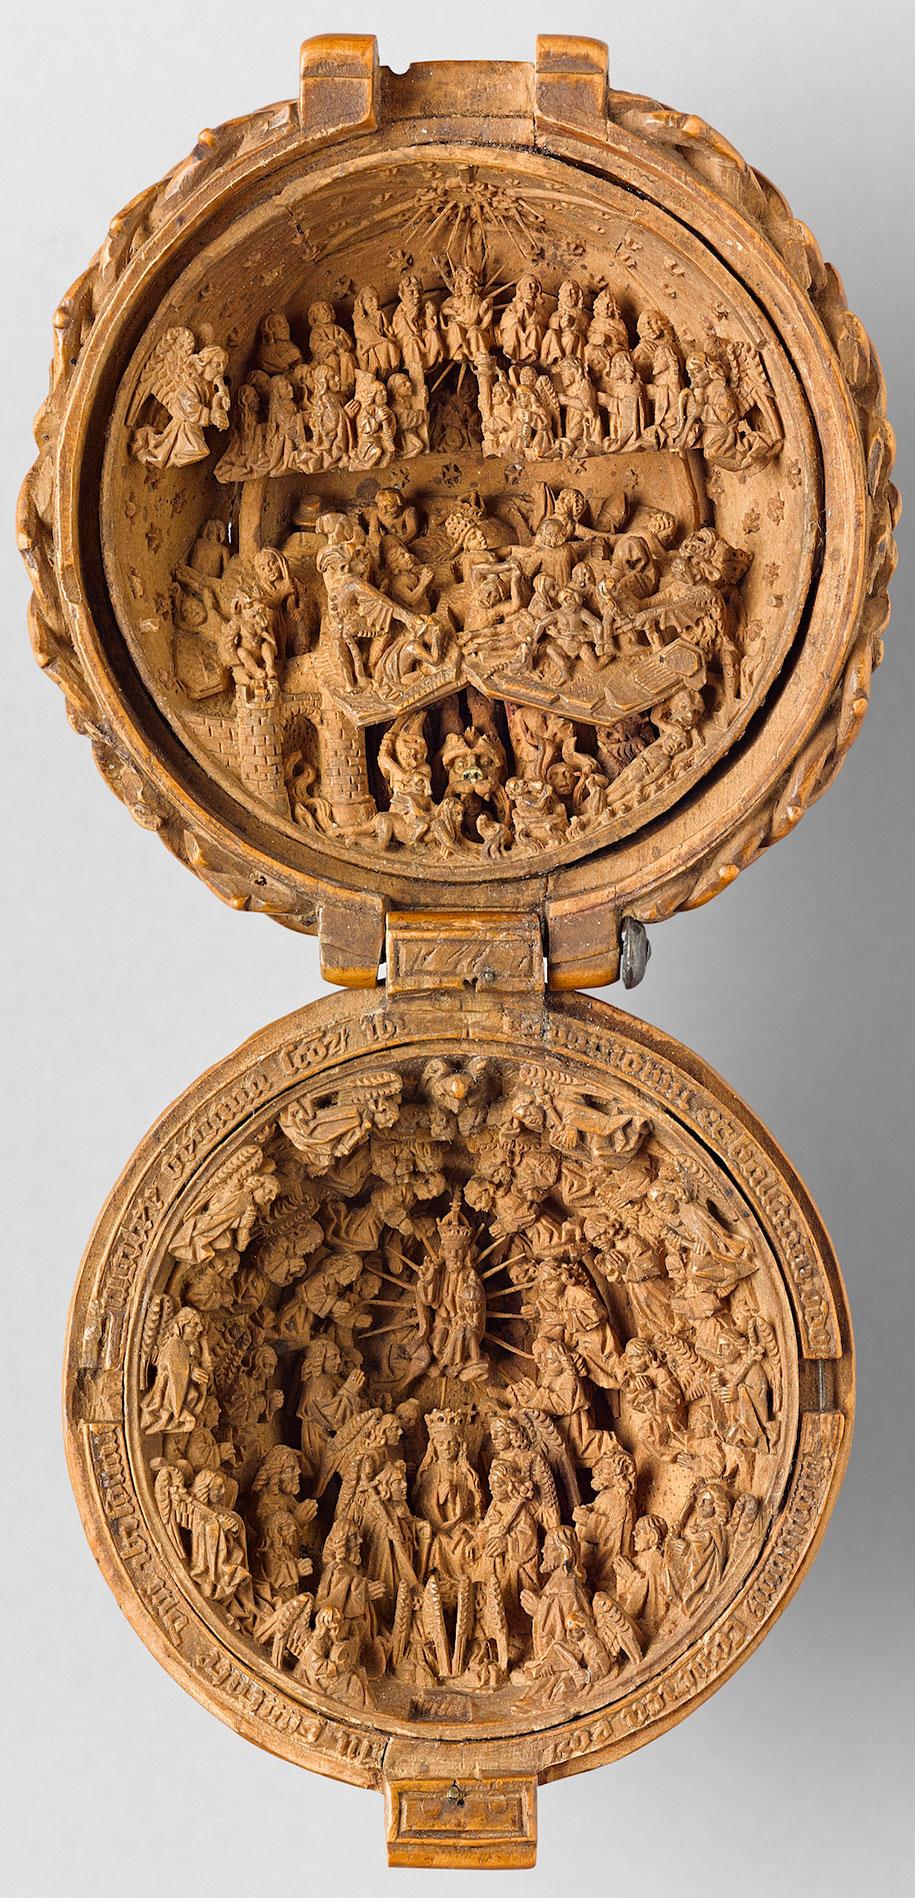 miniature-boxwood-carvings-16th-century-2